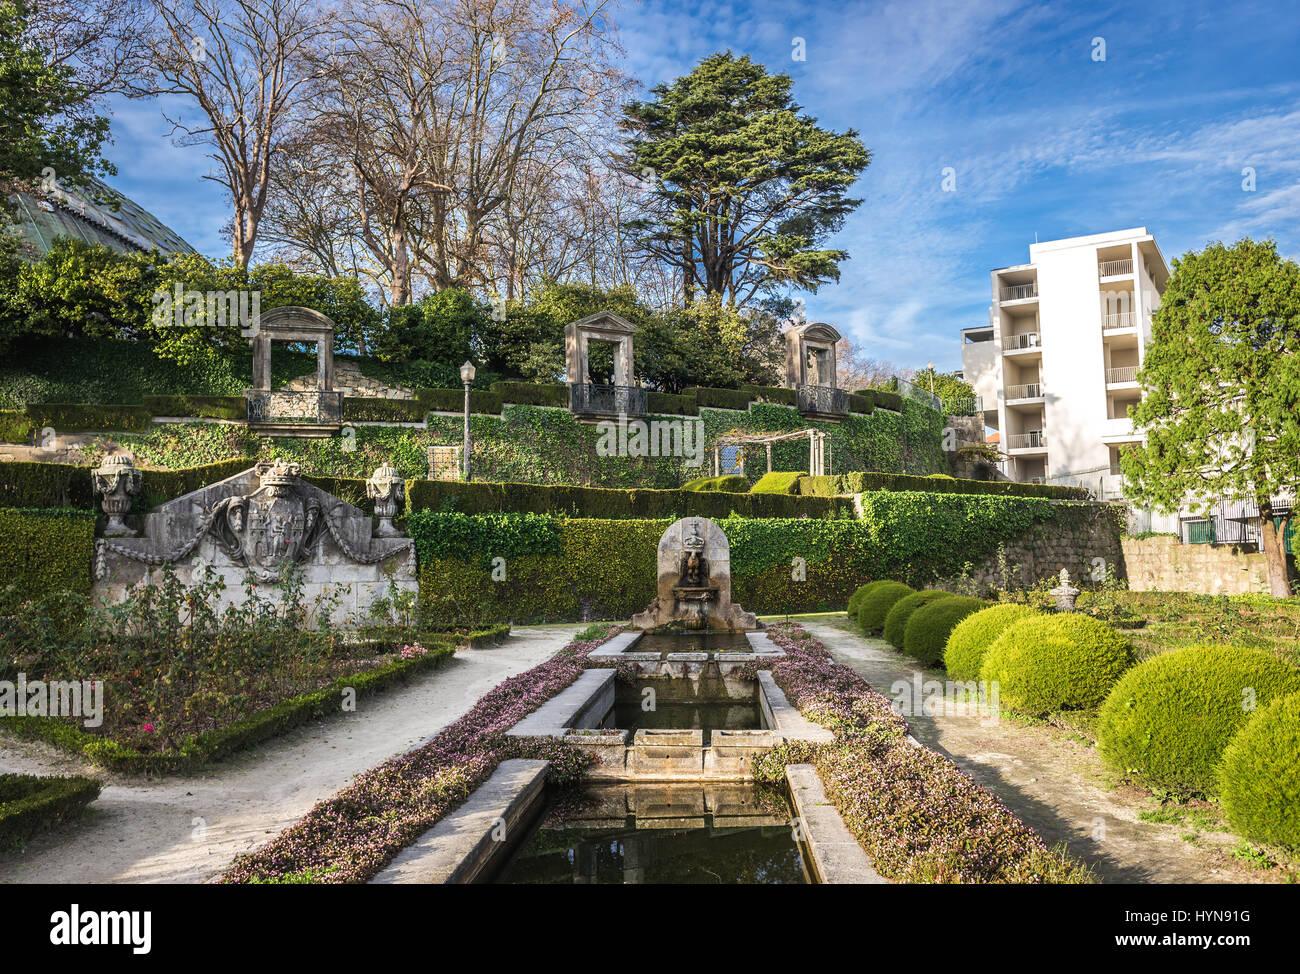 Crystal palace gardens jardins do palacio de cristal in for Jardines del palacio de cristal oporto